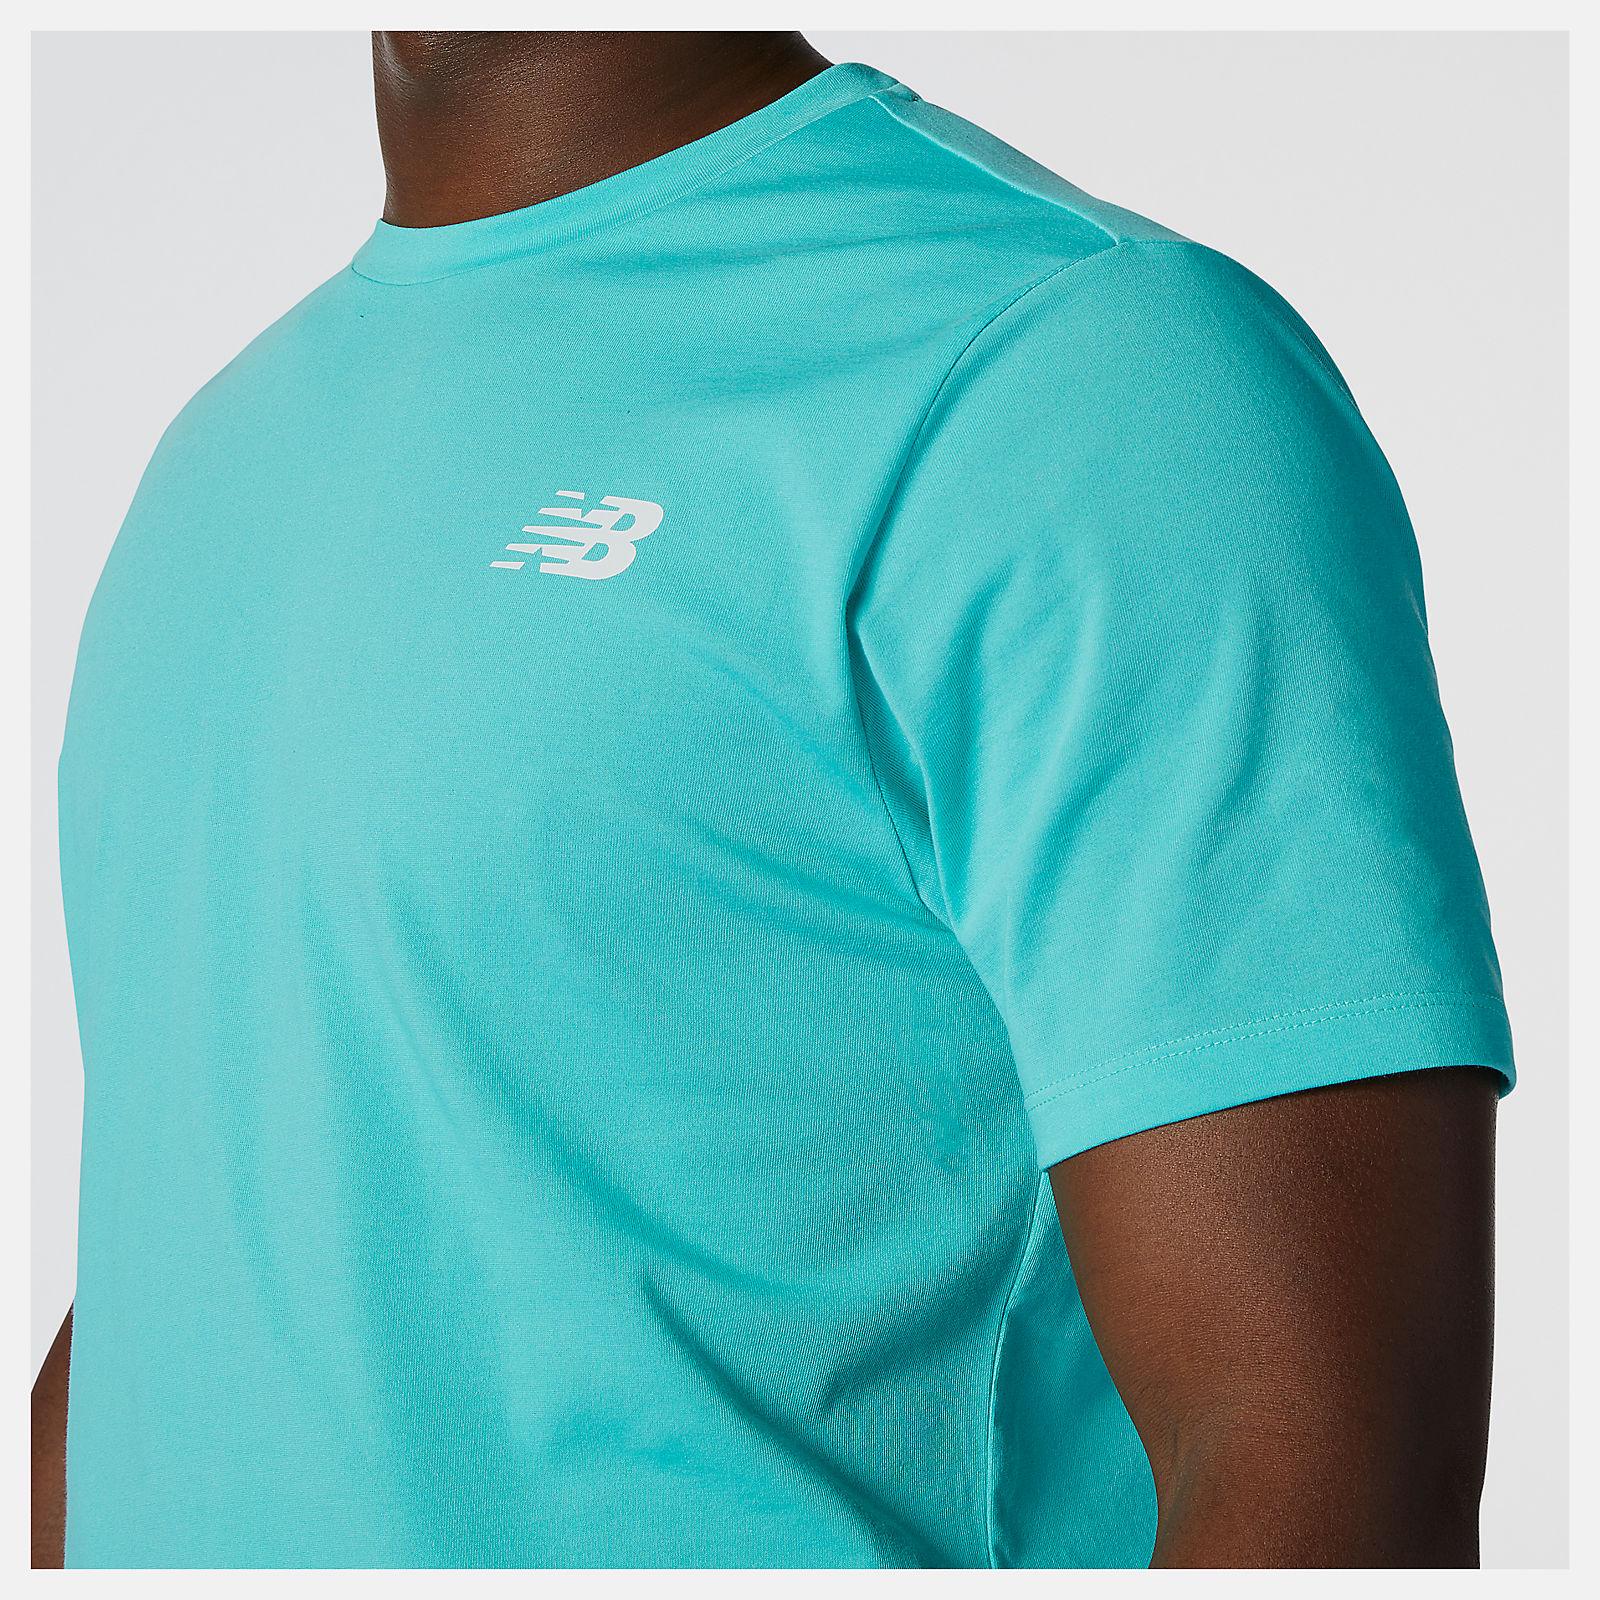 new balance heathertech t shirt